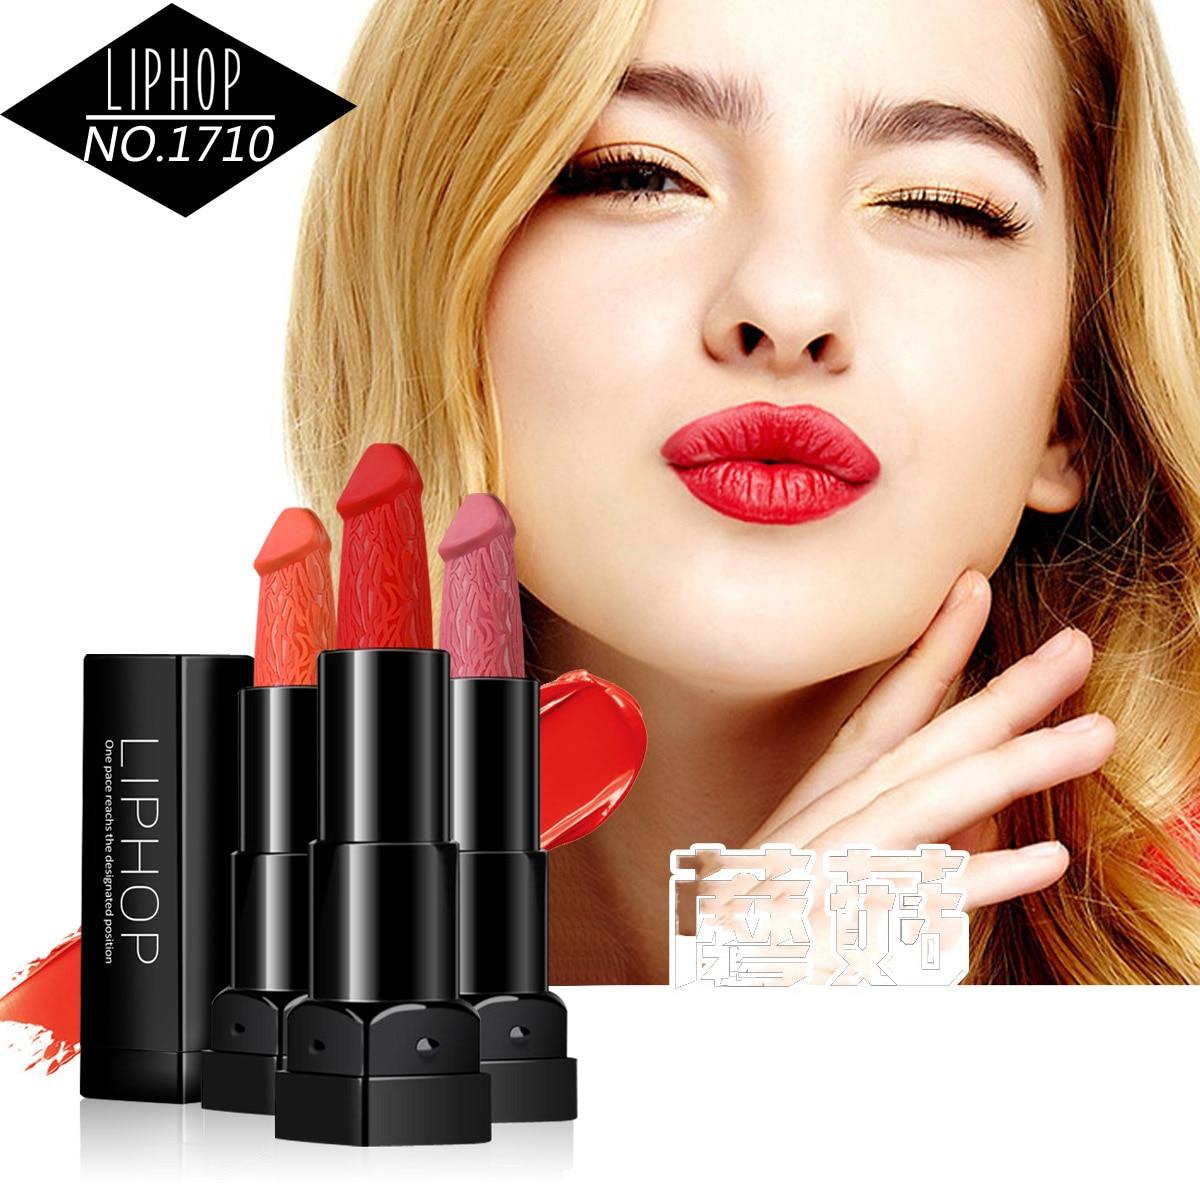 Liphop Brand 6 Colors Penis Shape Lipstick Mushroom Lipstick Long Lasting Moisture Cosmetic Rouge Pop Matte Lipstick Lips Makeup